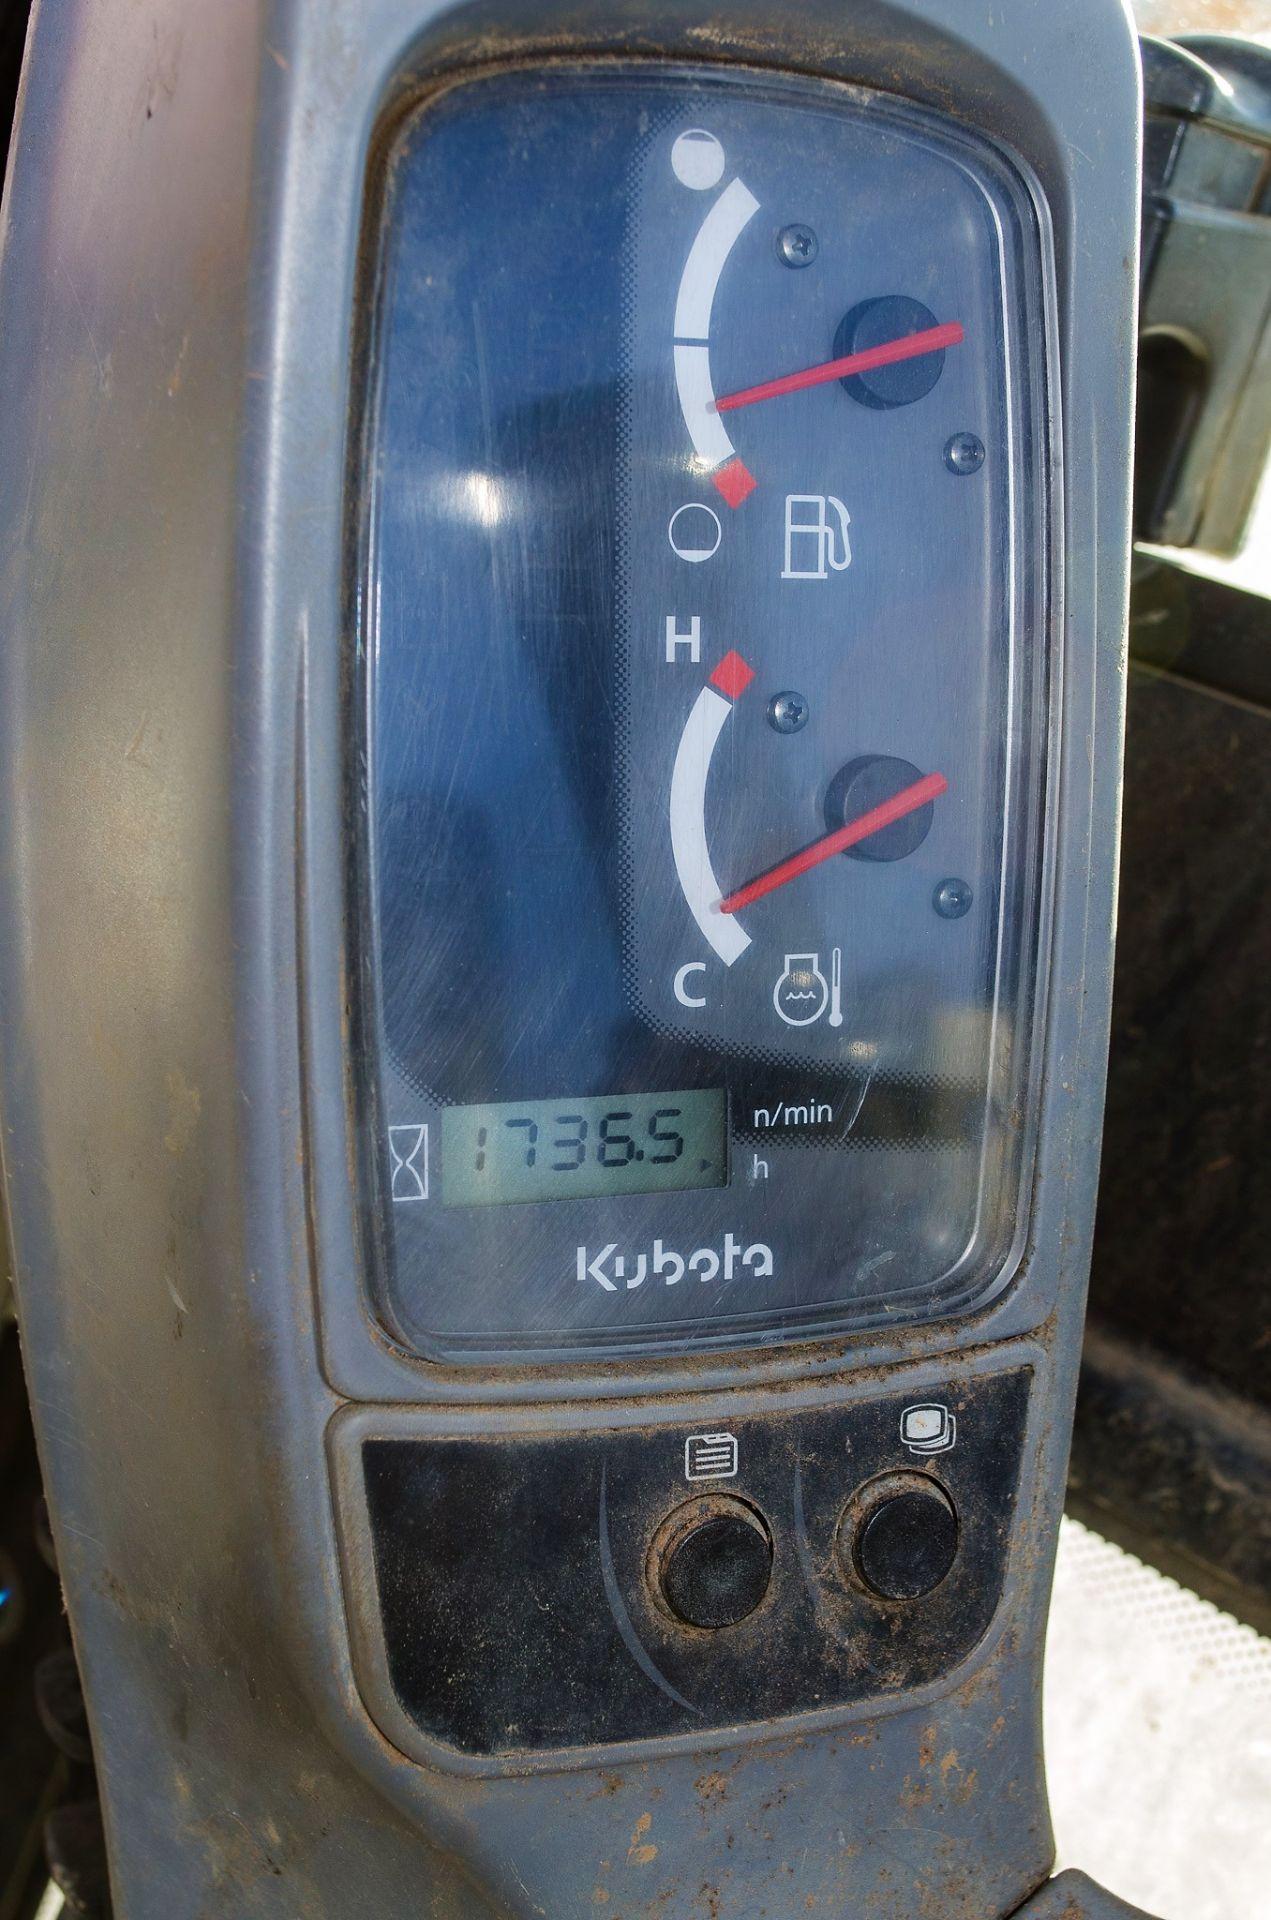 Kubota KX016-4 1.5 tonne rubber tracked mini excavator Year: 2015 S/N: 58688 Recorded Hours: 1736 - Image 17 of 19